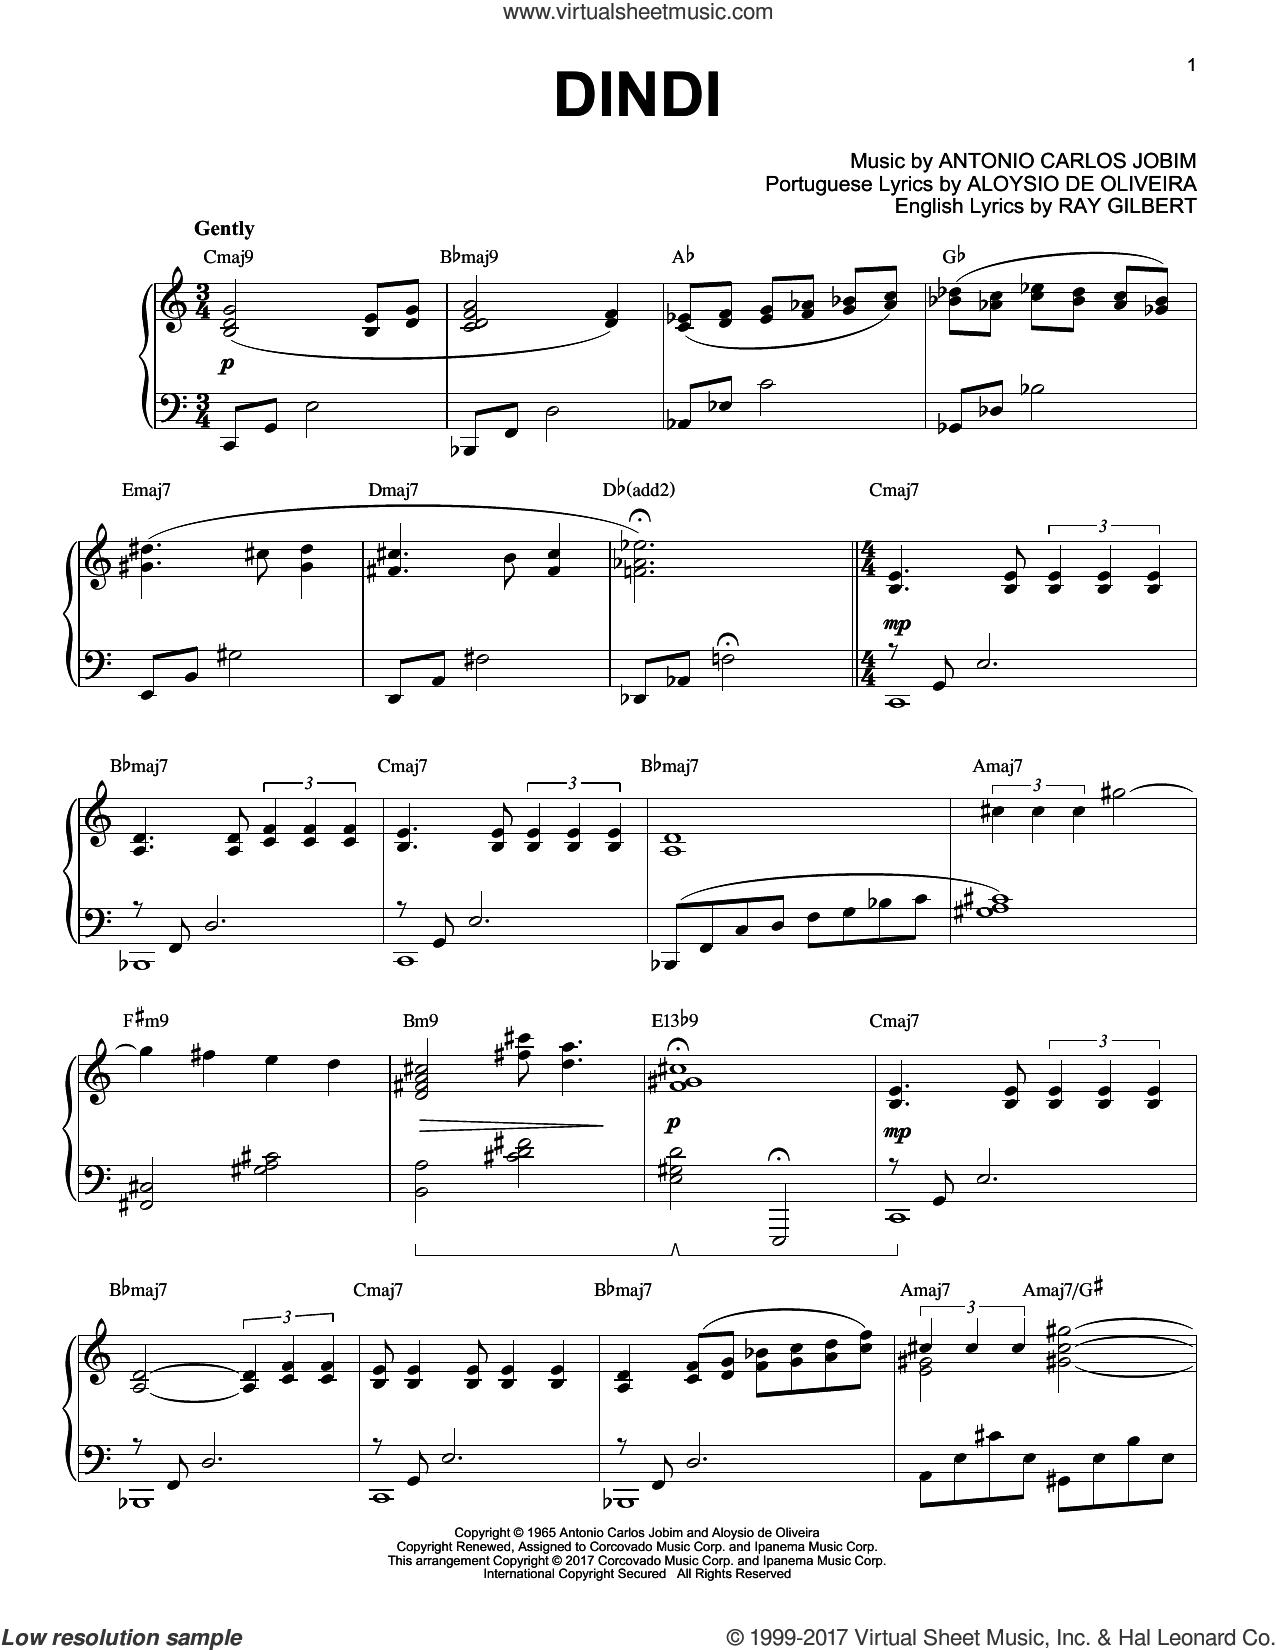 Dindi sheet music for piano solo by Antonio Carlos Jobim, Aloysio de Oliveira and Ray Gilbert, intermediate skill level